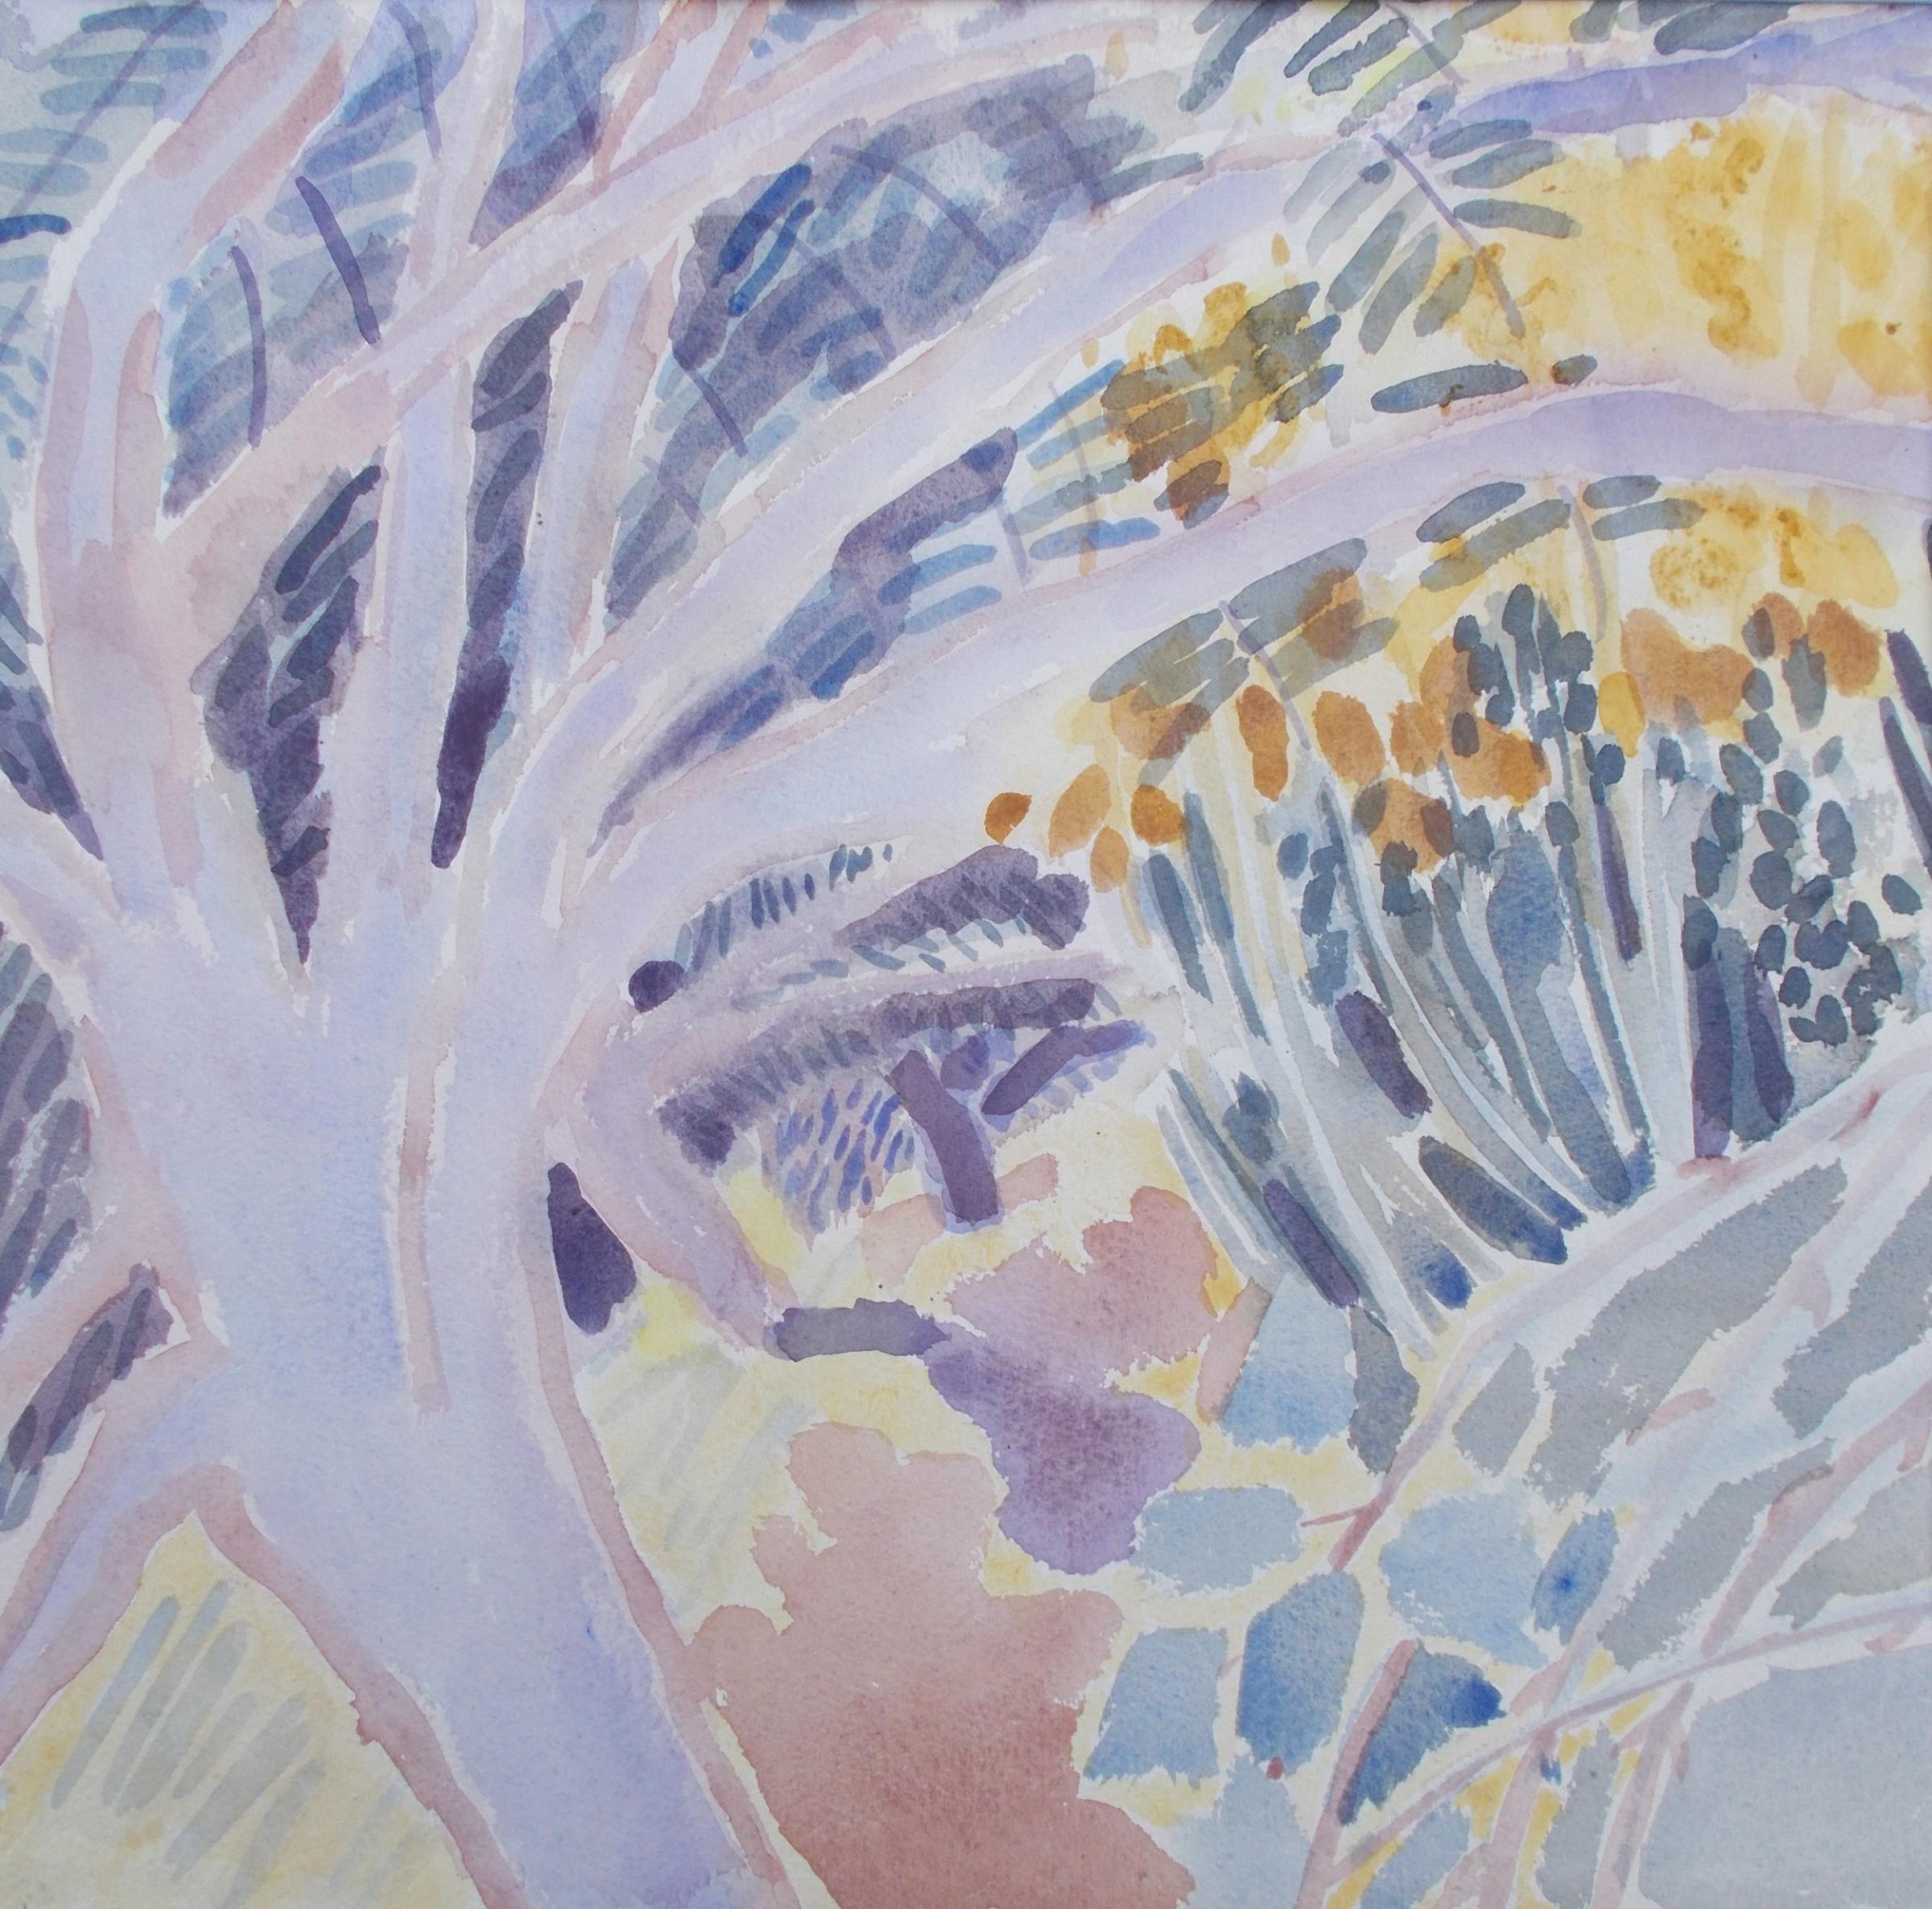 "<span class=""link fancybox-details-link""><a href=""/artists/80-anne-marlow/works/12257-anne-marlow-a-yew-tree-walk/"">View Detail Page</a></span><div class=""artist""><span class=""artist""><strong>Anne Marlow</strong></span></div><div class=""title""><em>A Yew Tree Walk</em></div><div class=""medium"">watercolour</div><div class=""dimensions"">Frame: 52 x 52.5 cm<br /> Artwork: 37 x 38 cm</div><div class=""price"">£365.00</div>"